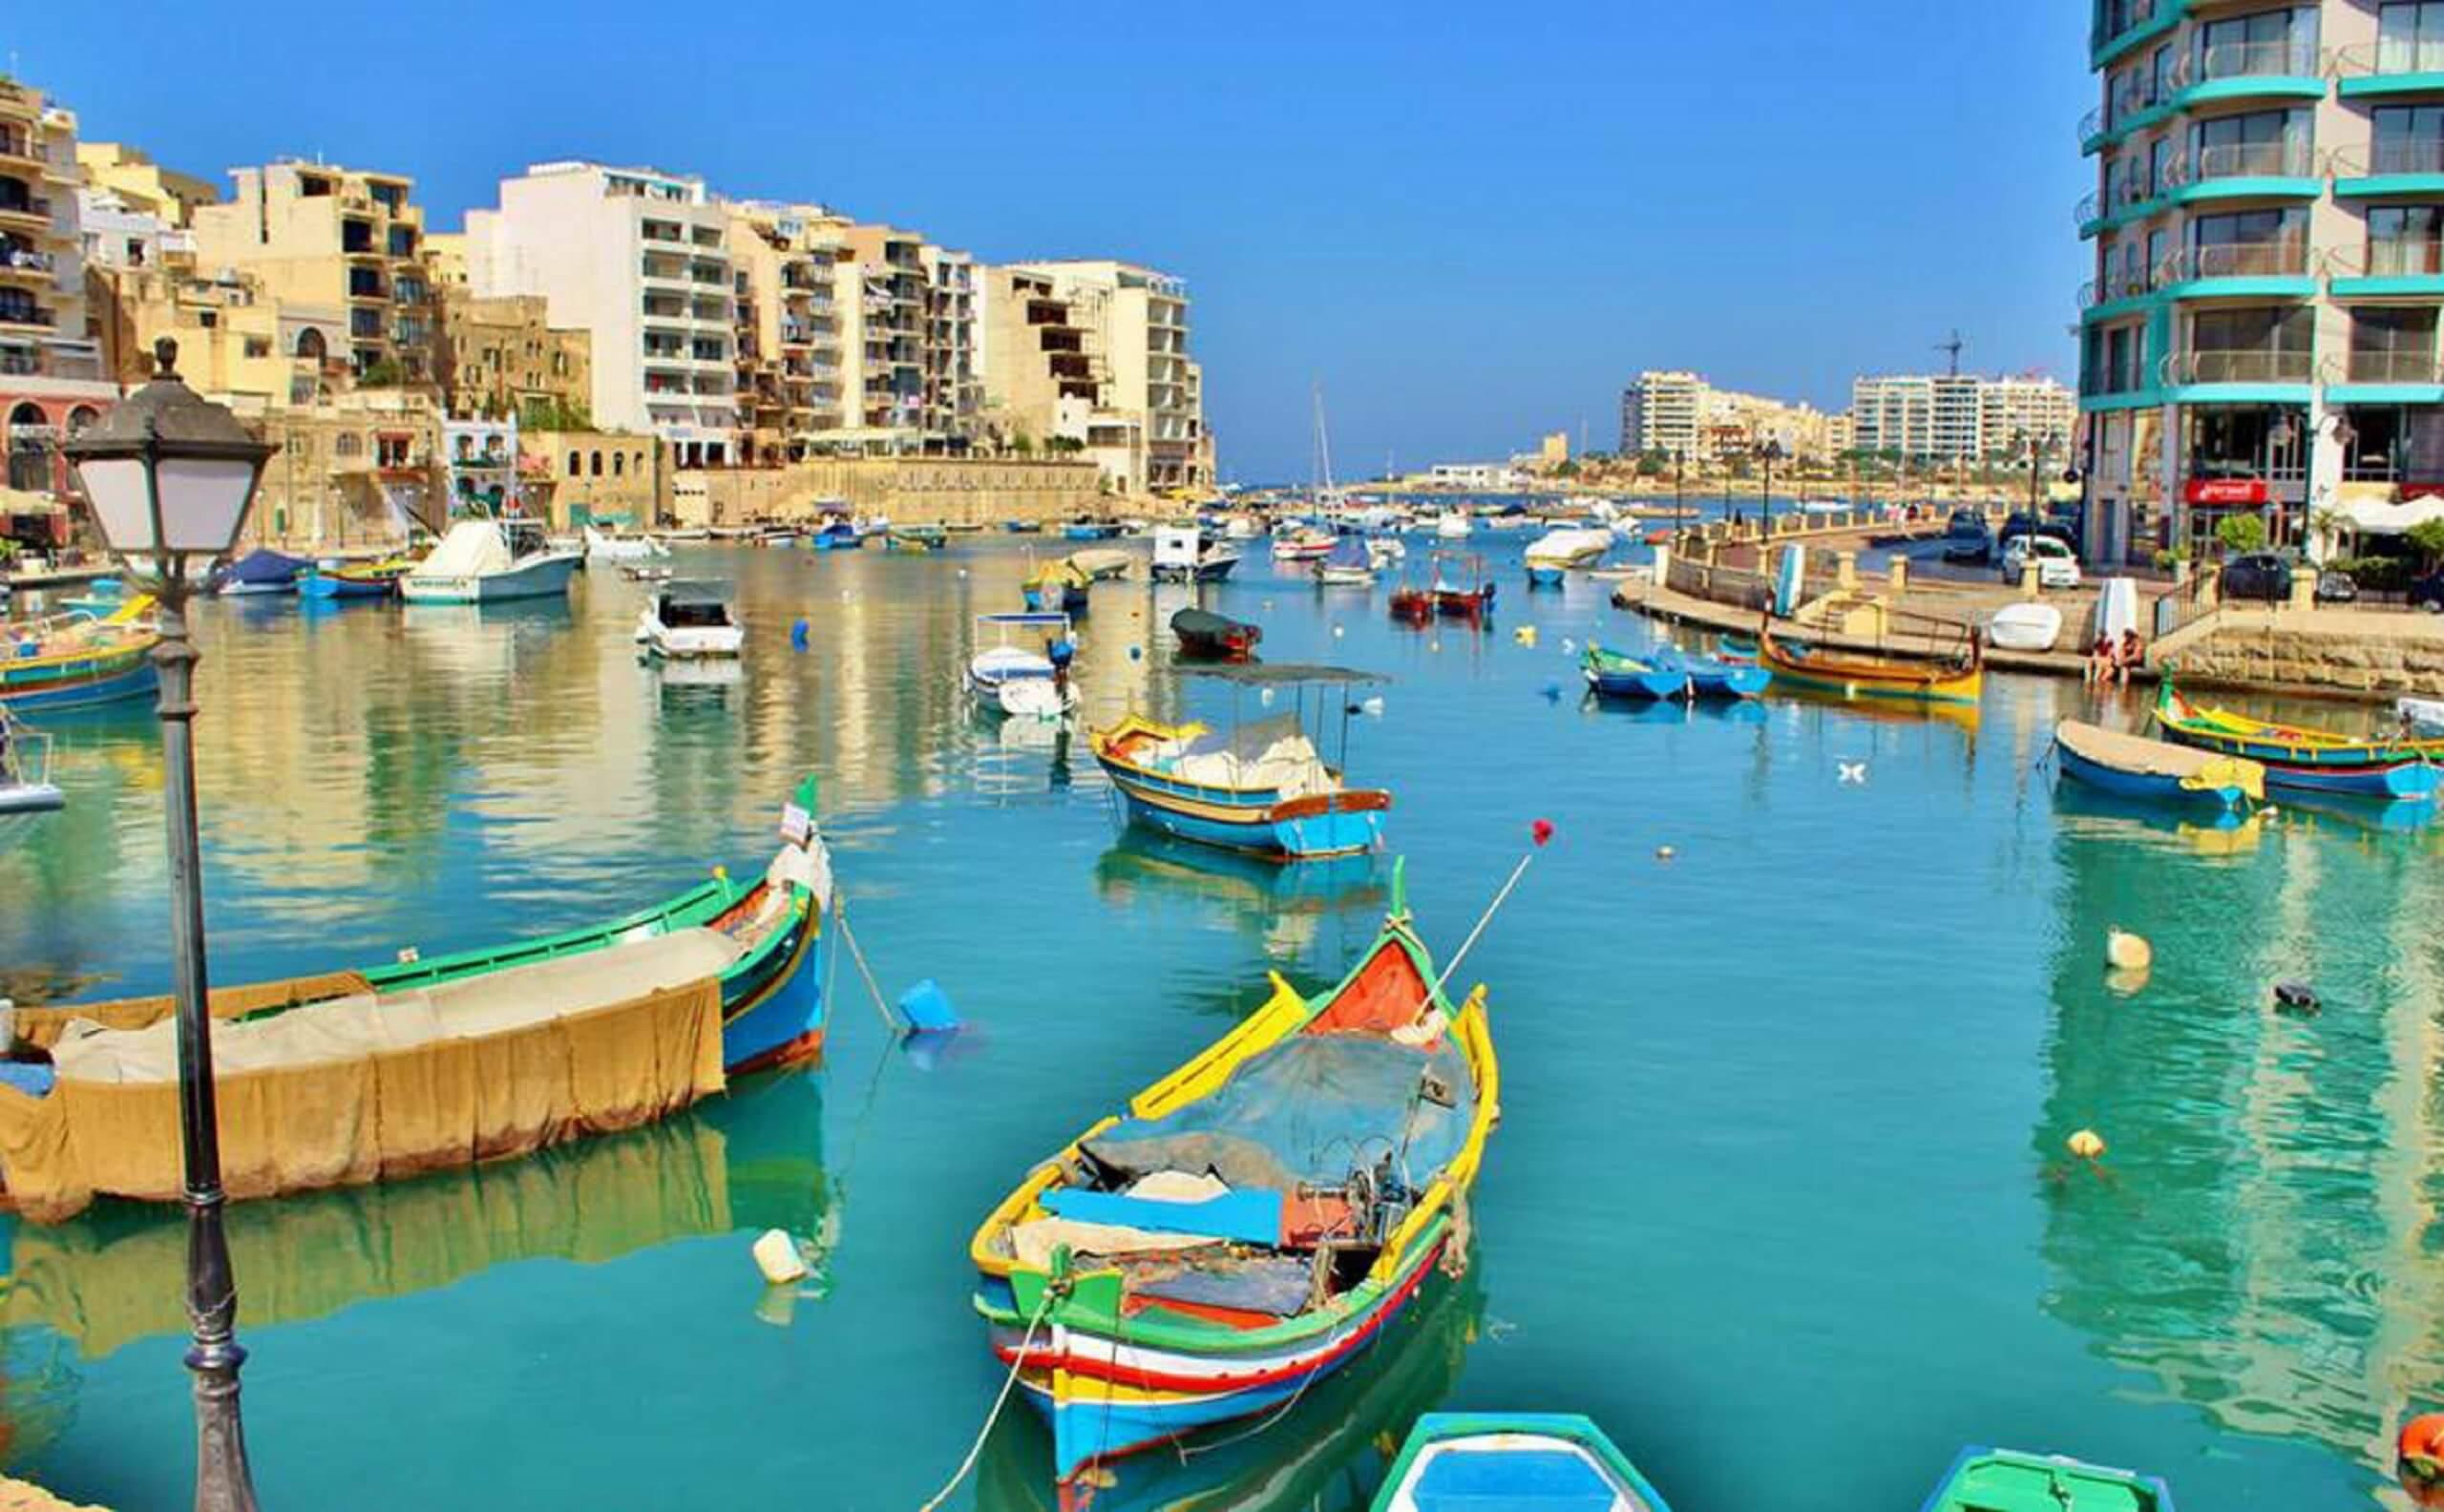 malta-waterway-dock-stockpack-pixabay